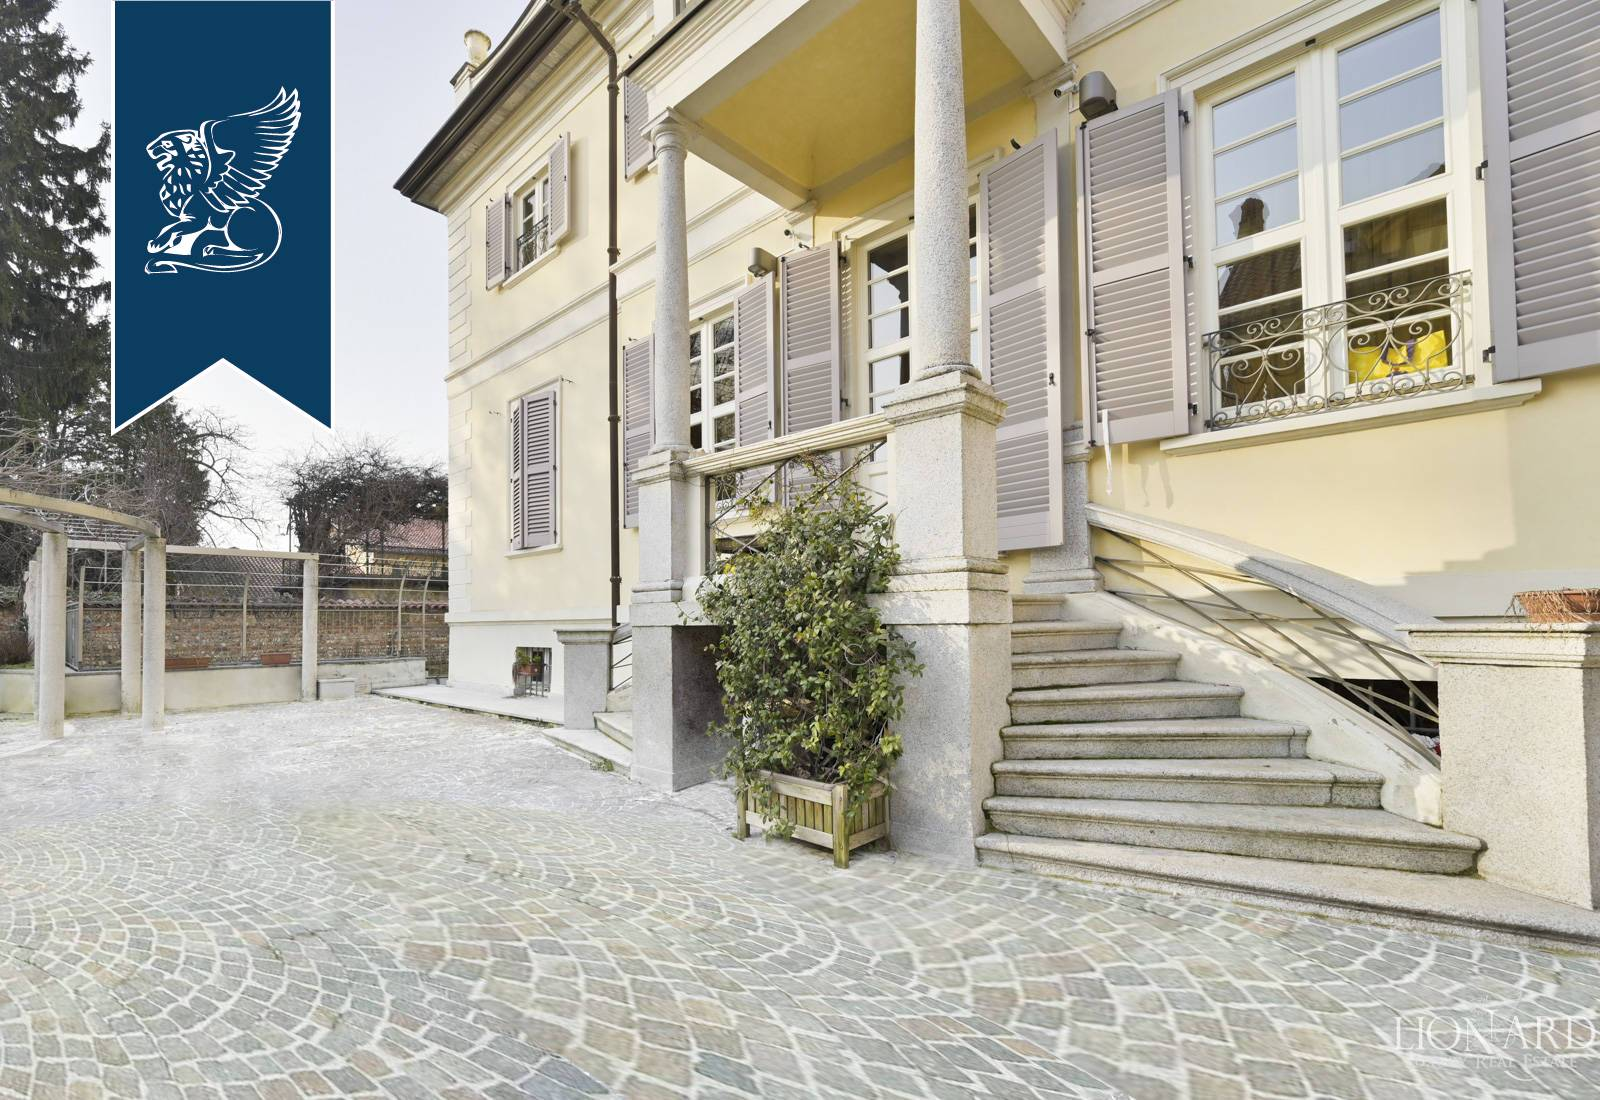 Villa in Vendita a Buscate: 0 locali, 890 mq - Foto 5